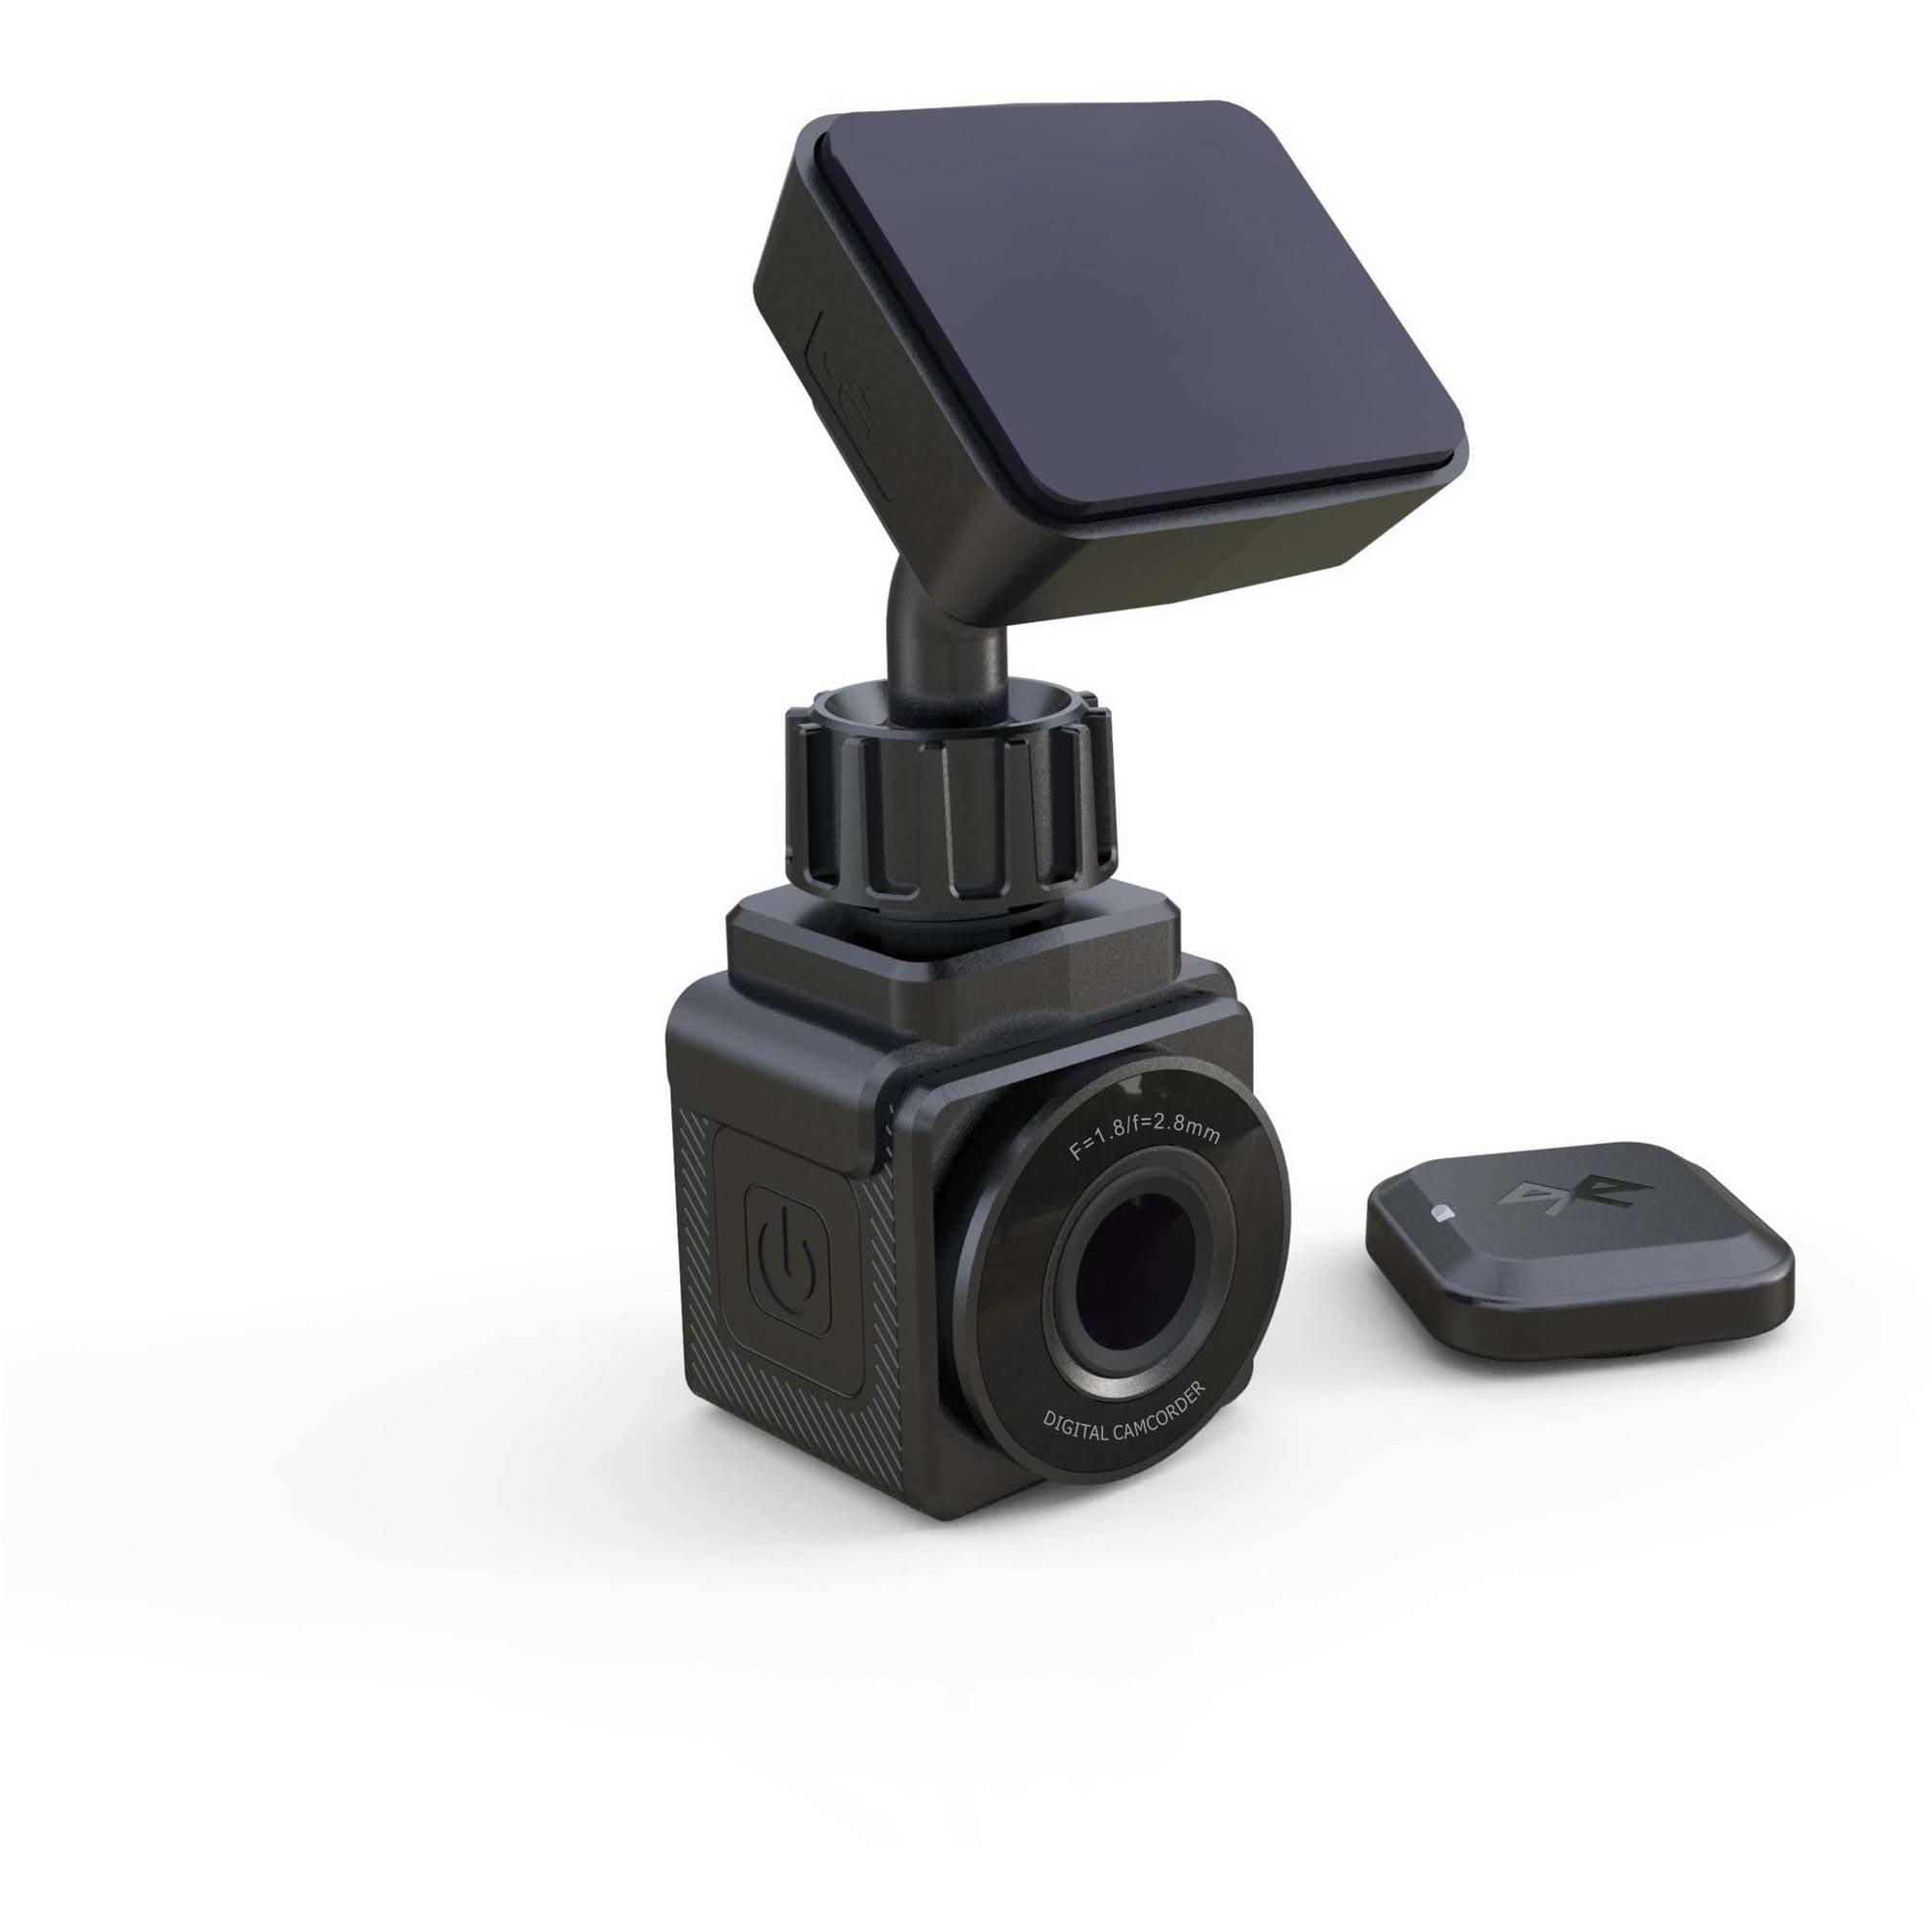 GEKO X10016G Xpedition Smart Dash Camera with 16GB microSD Card, Black